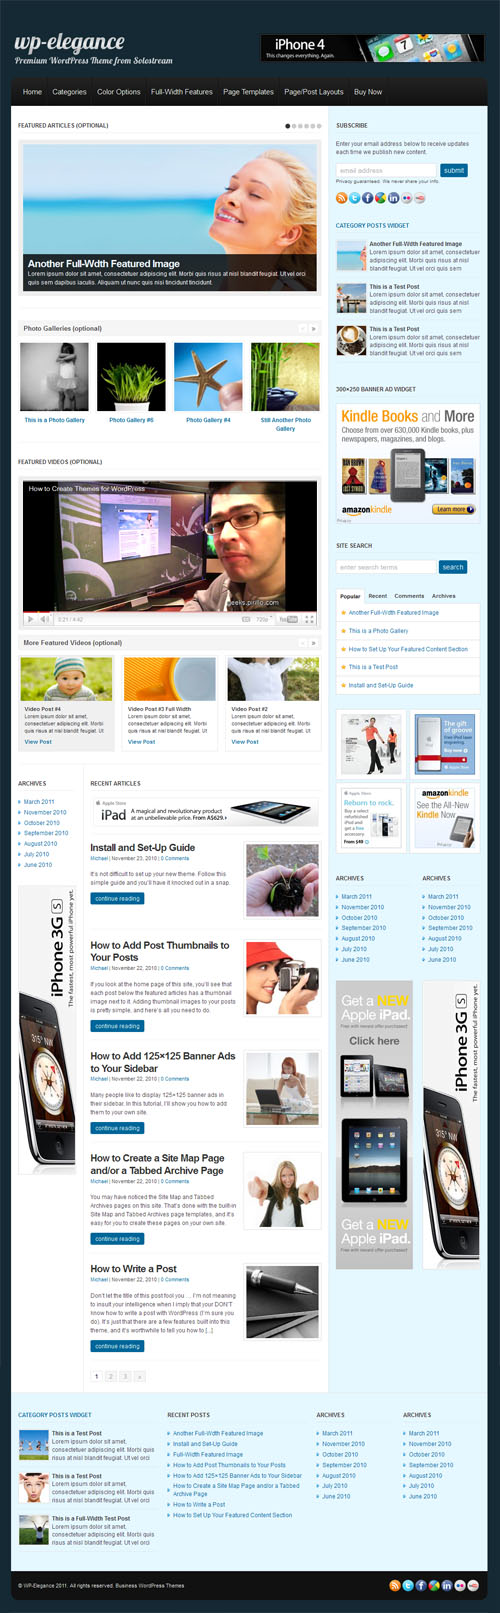 WP Elegance Premium WordPress Theme